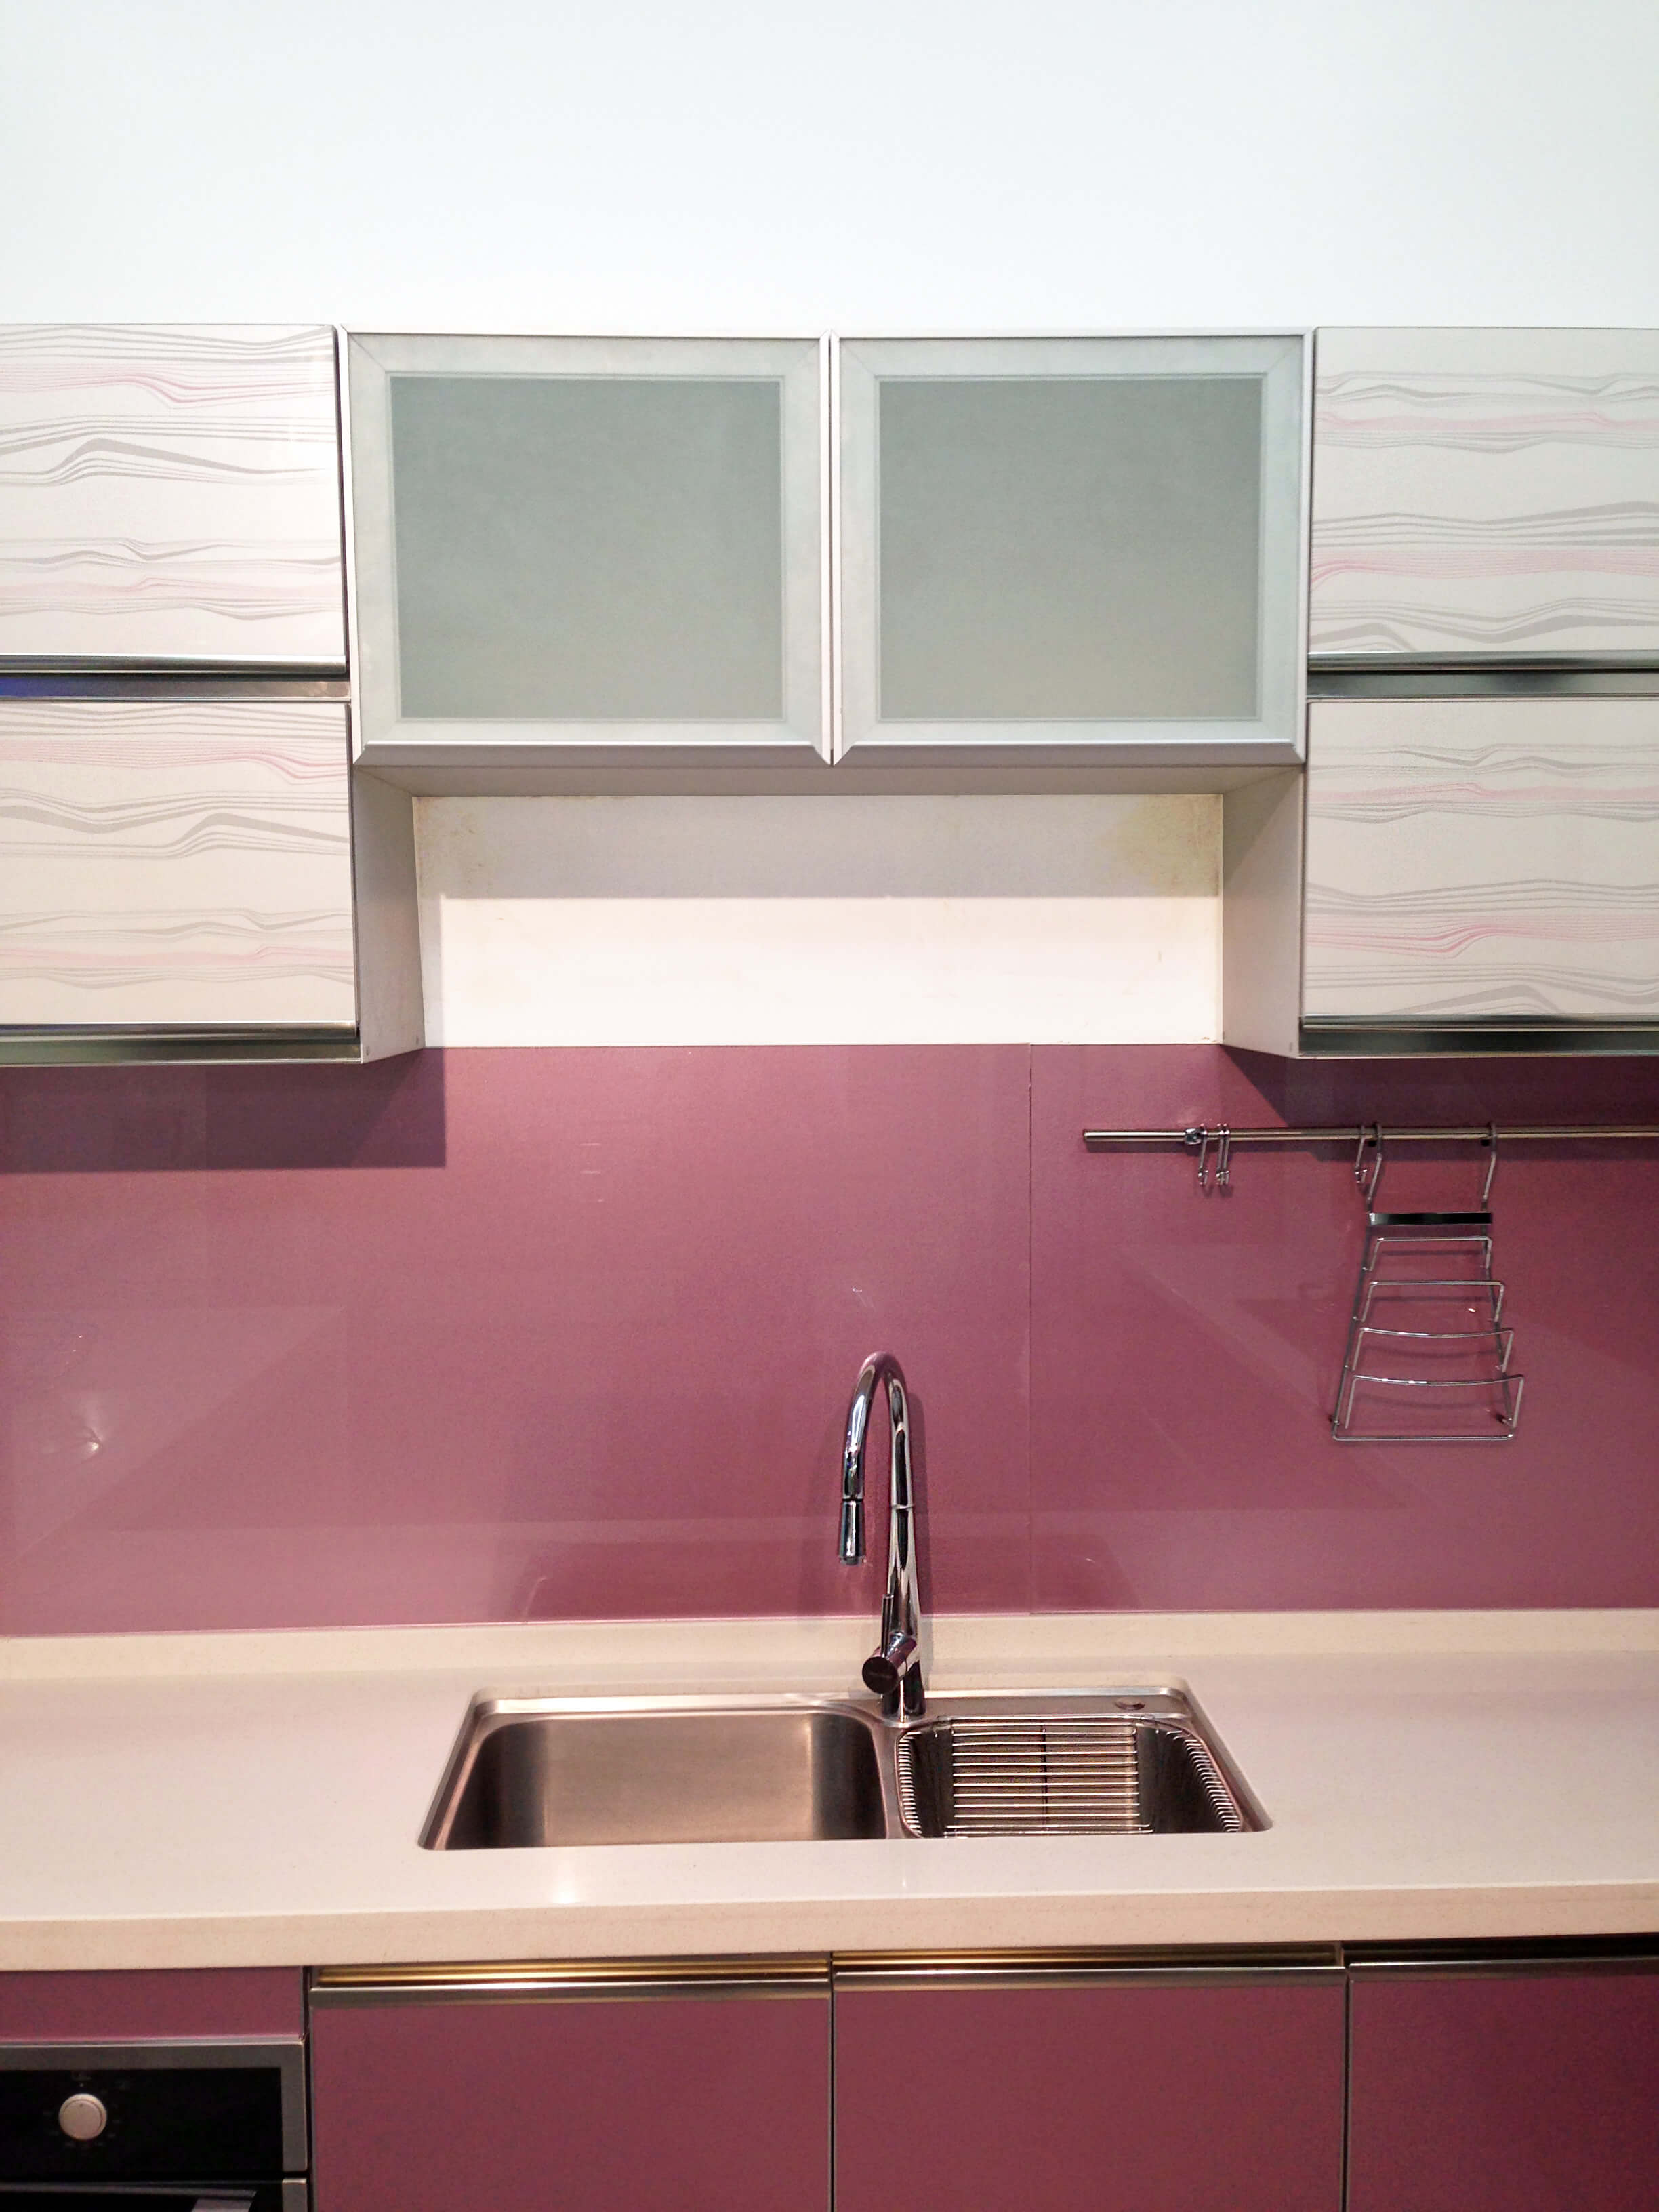 Ideal Home Design International | ROSA KITCHEN